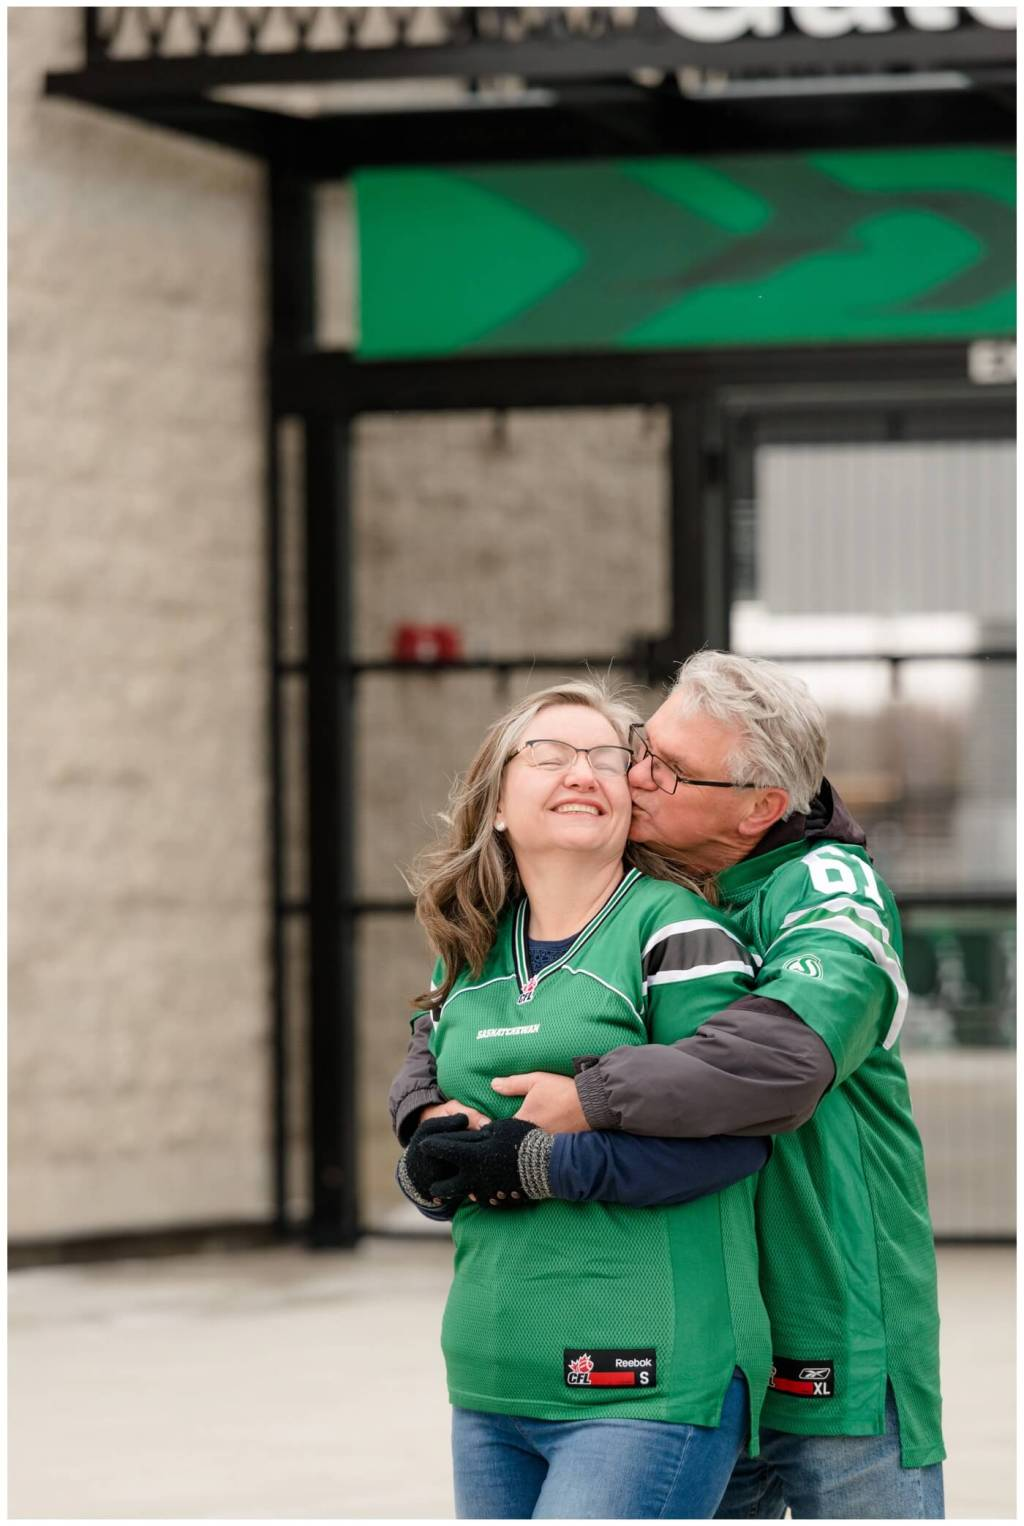 Regina Family Photographer - Fahlman Family - Marilyn-Mike - Rider Pride - Family Session - Kisses at Mosaic Stadium